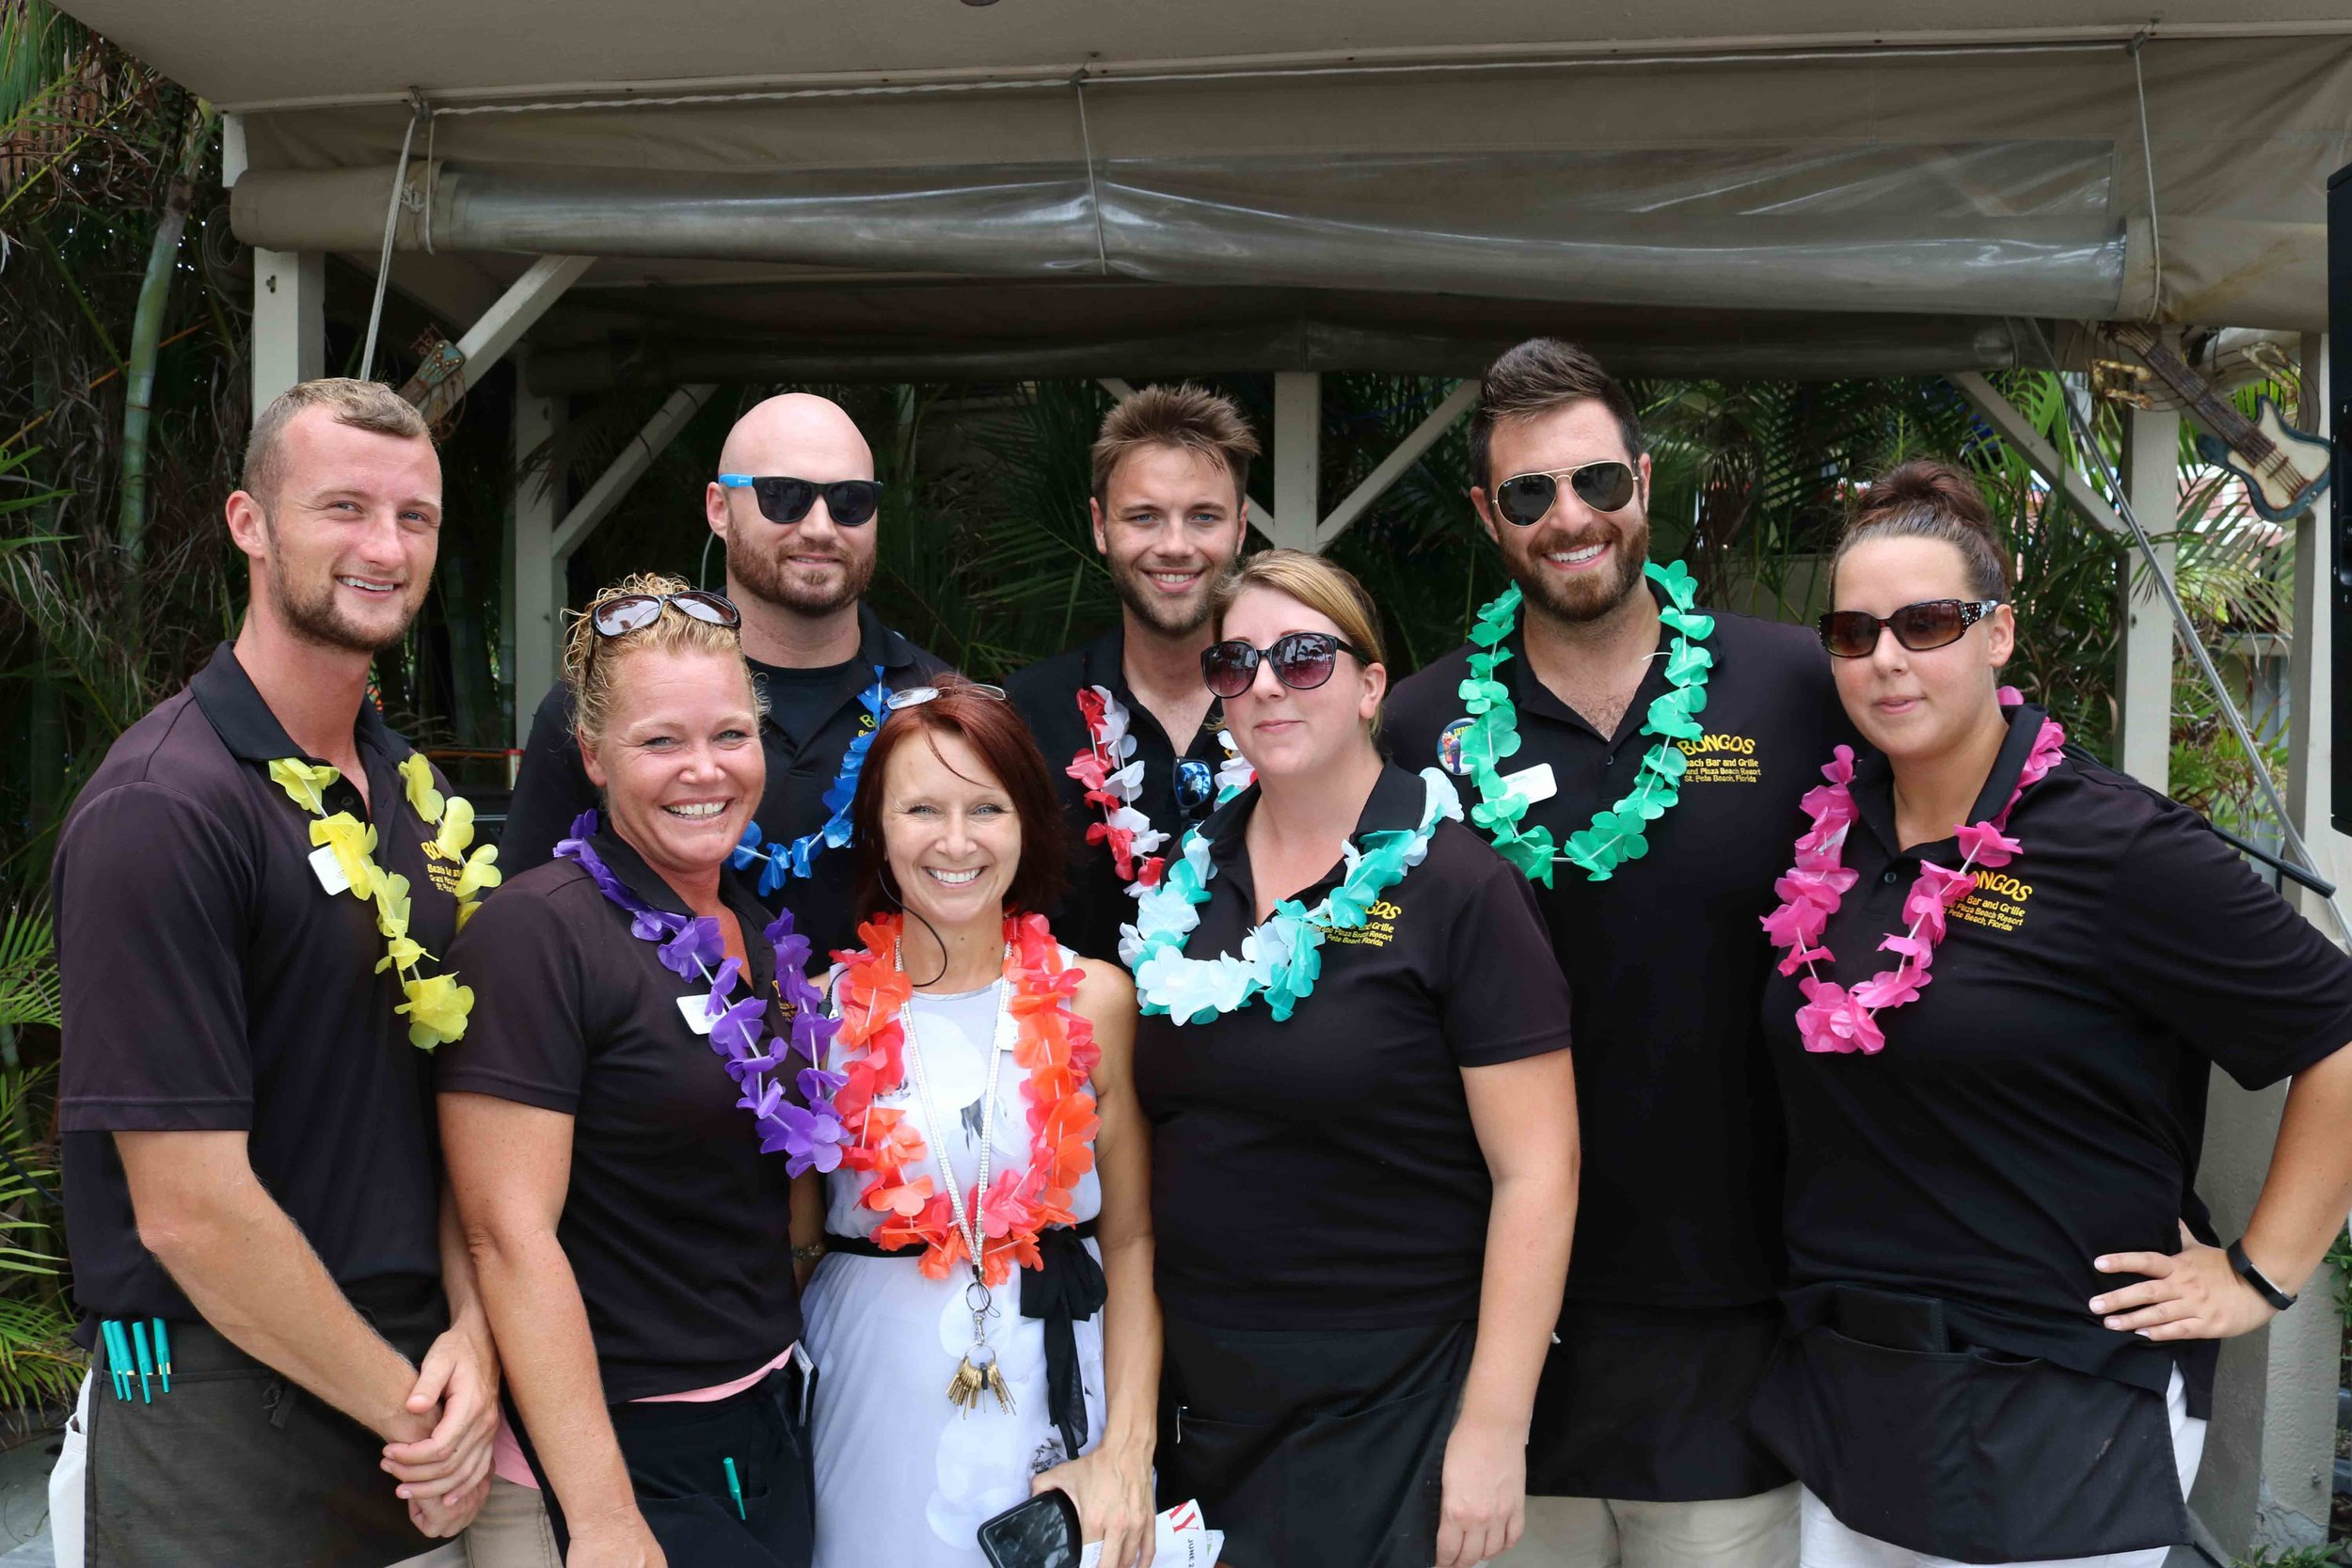 The staff at Bongos Beach Bar celebrates